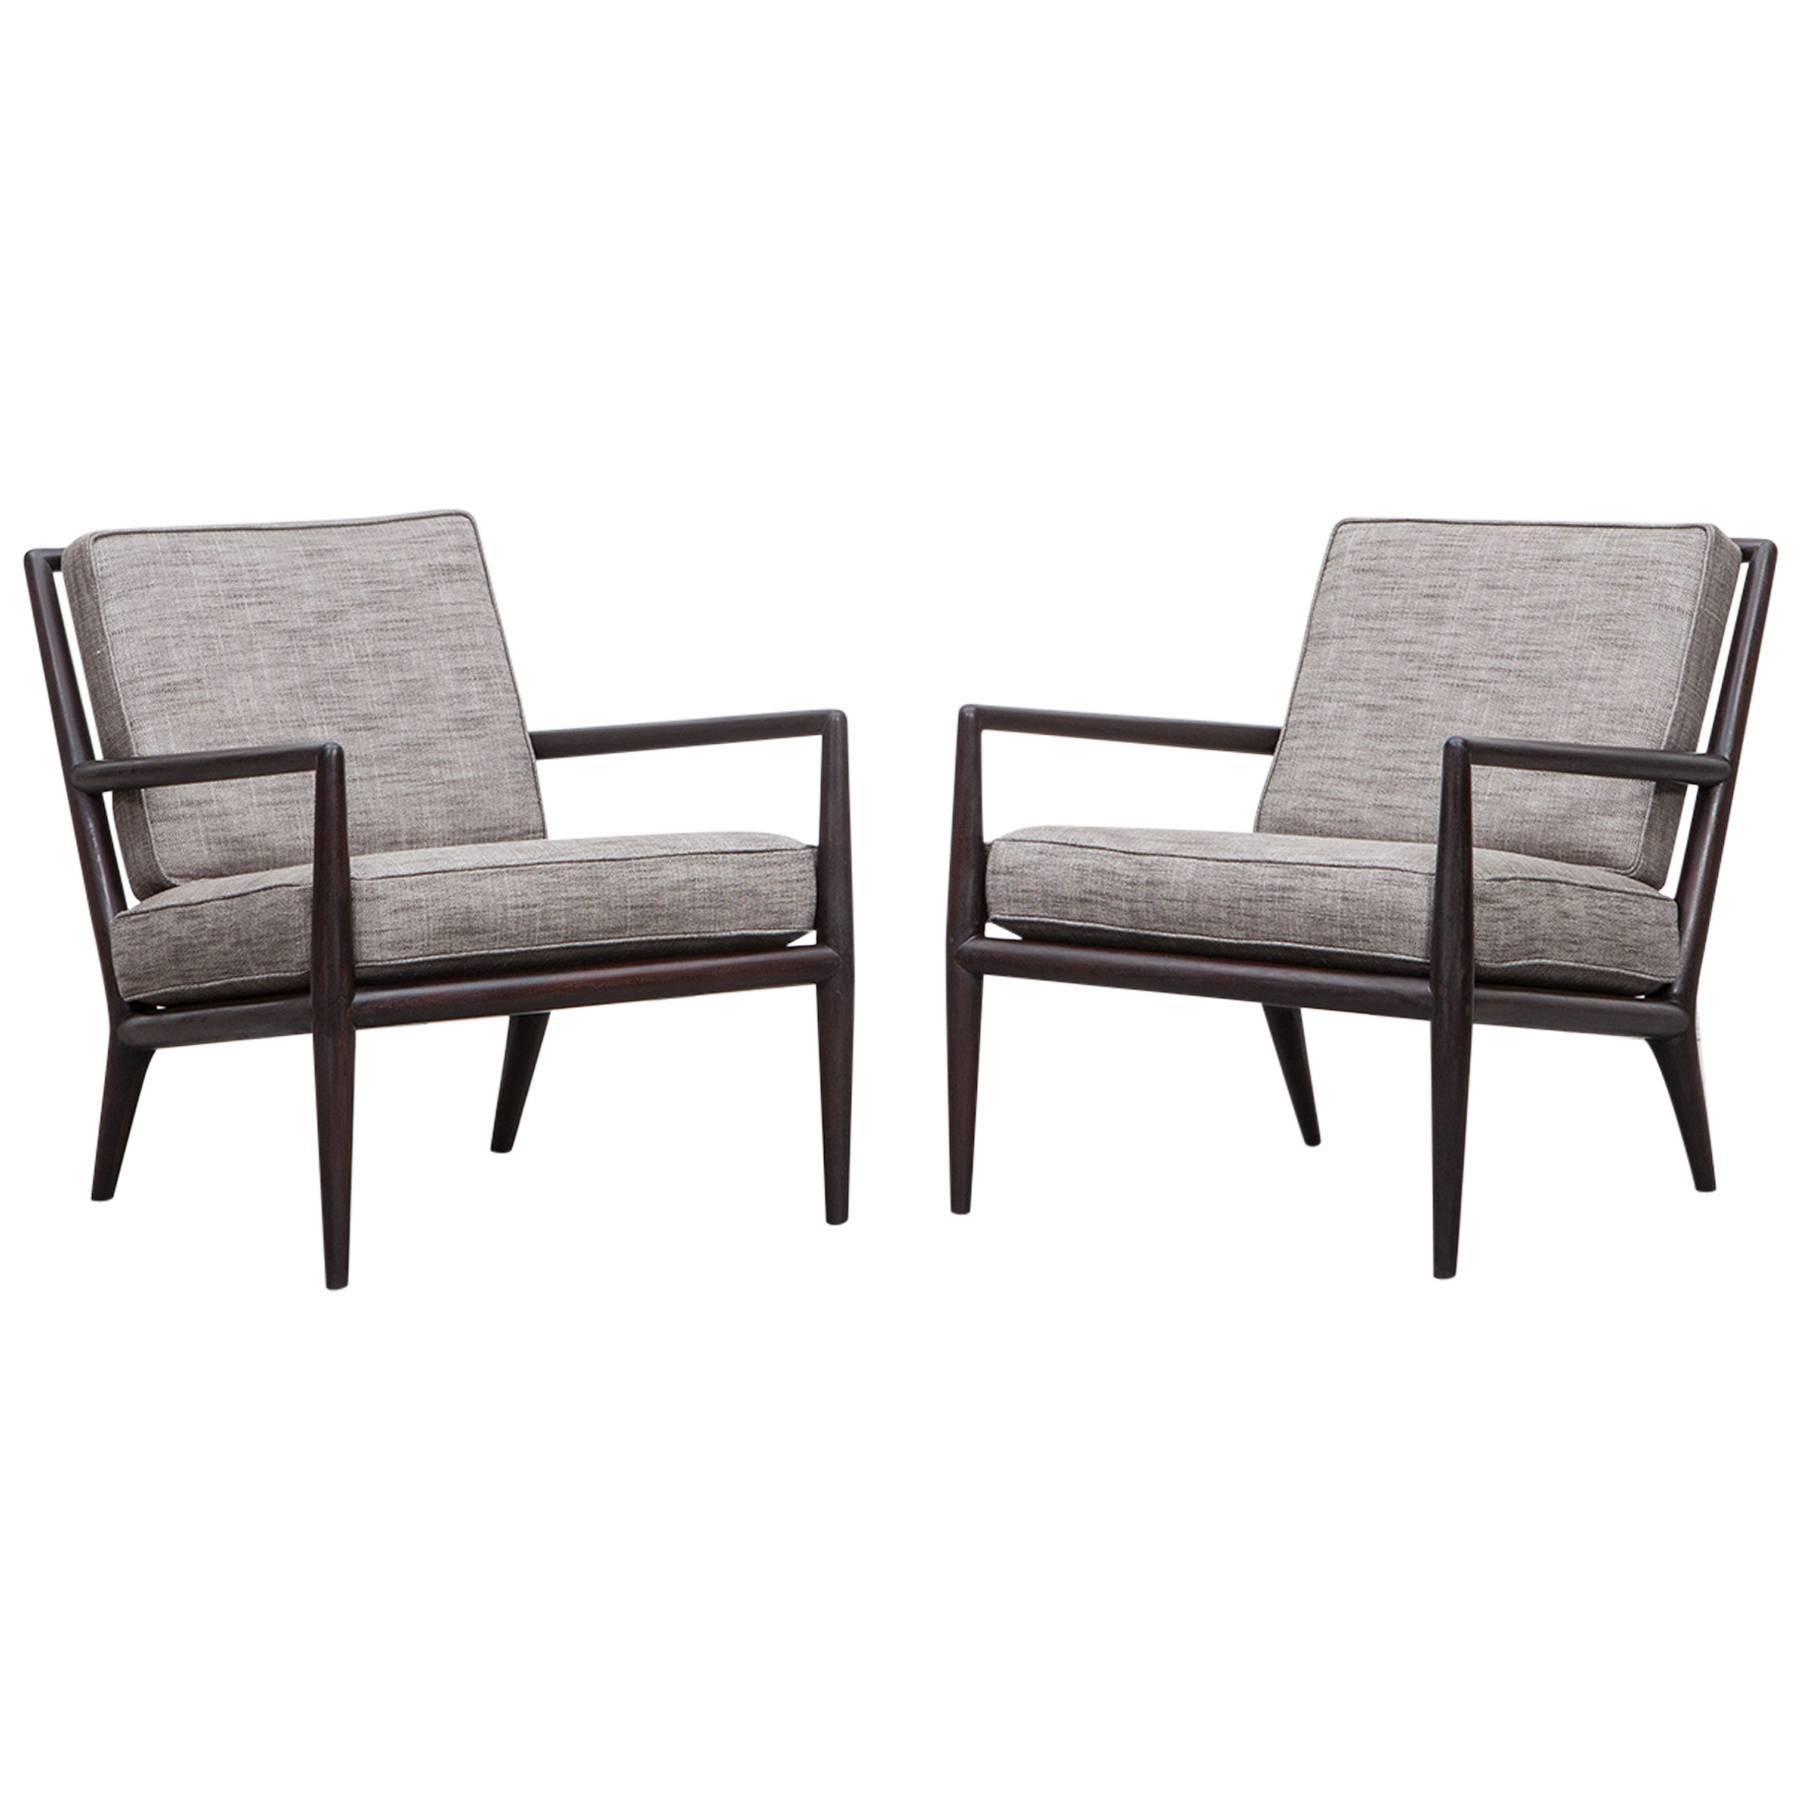 Pair of T. H. Robsjohn-Gibbings Lounge Chairs * NEW UPHOLSTERY *